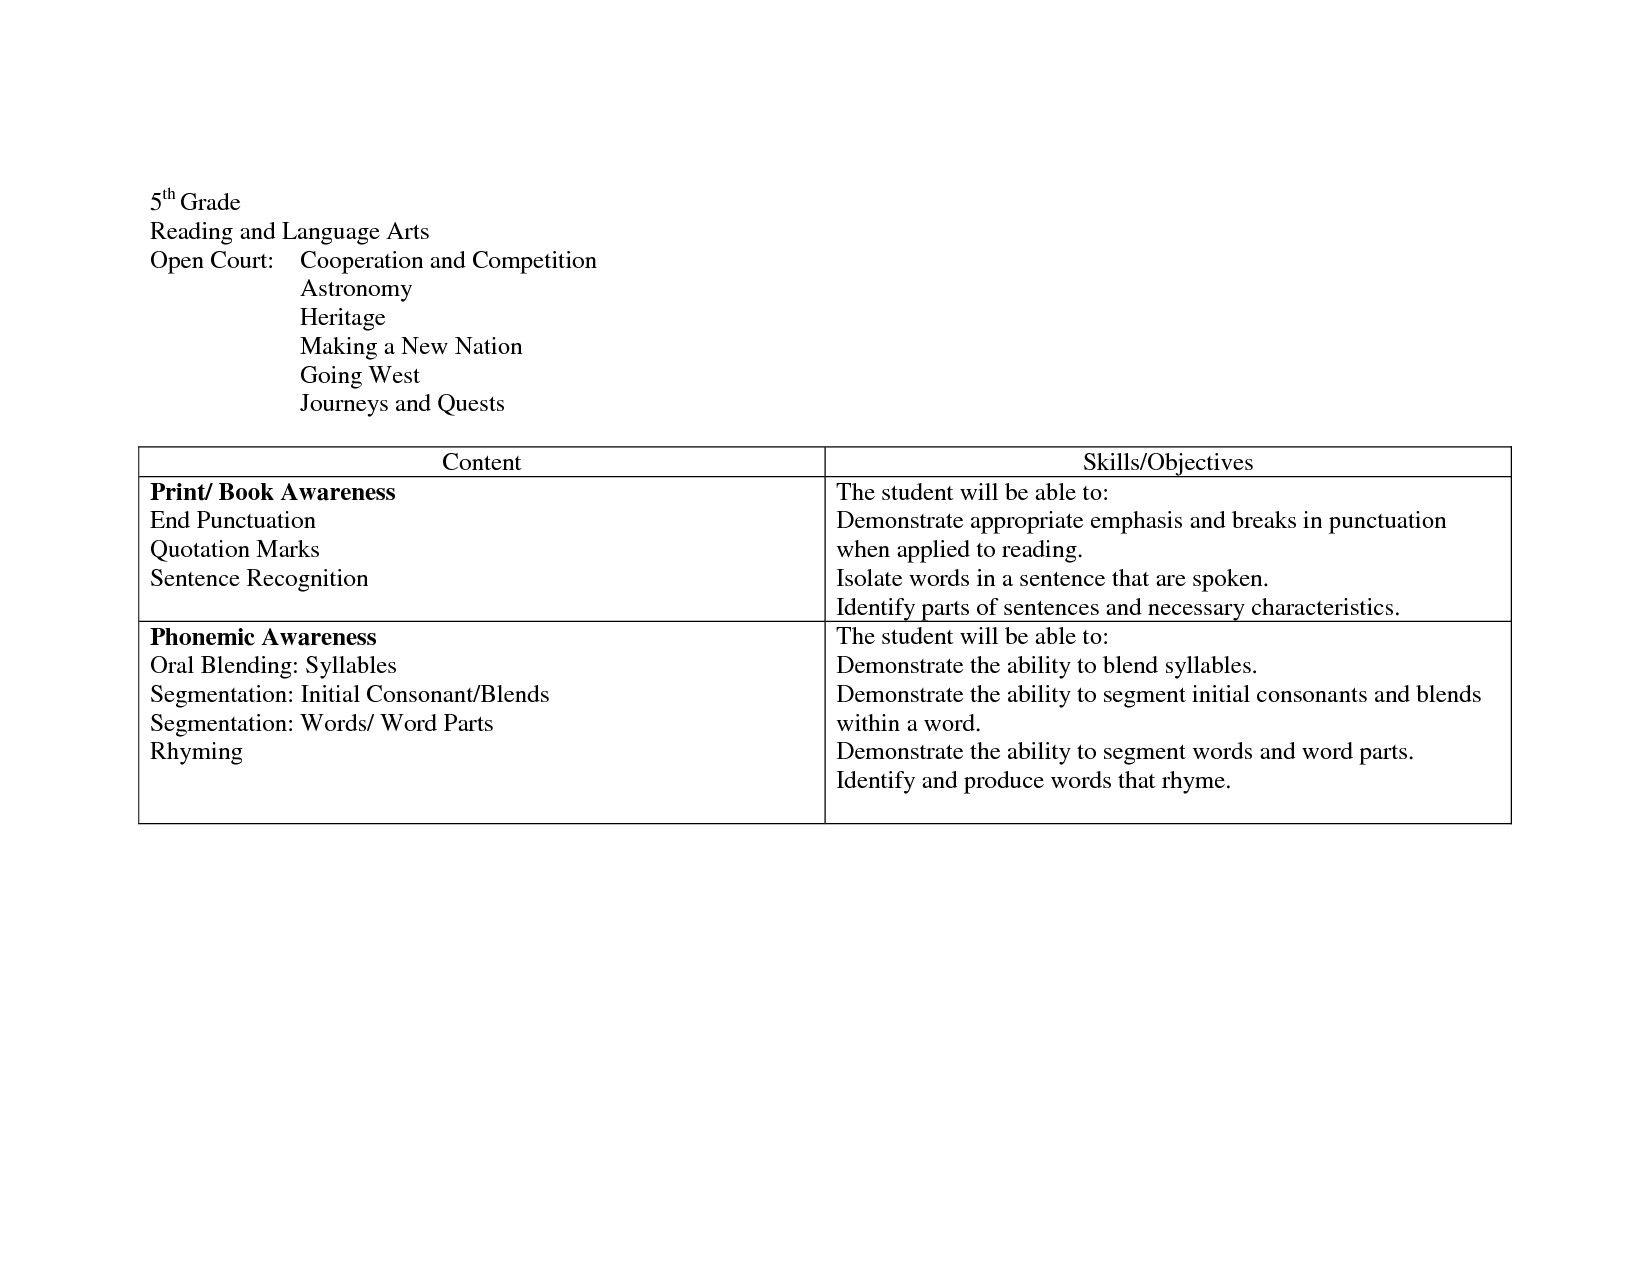 5th Grade Punctuation Worksheets di 2020